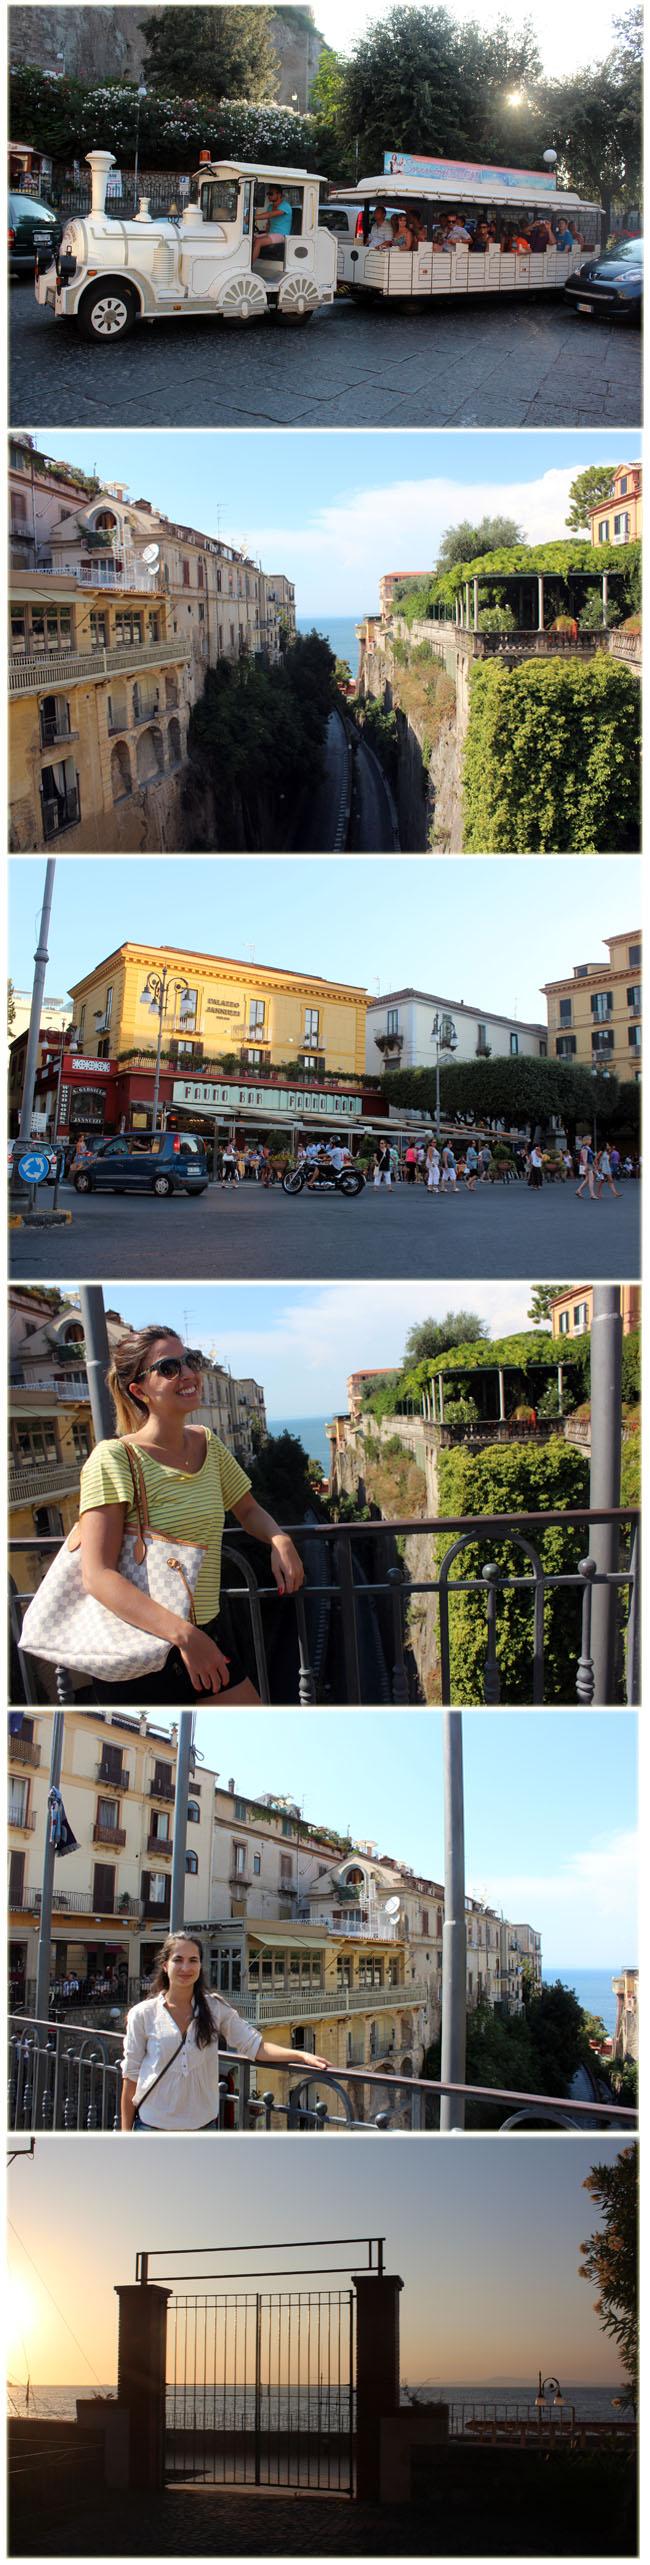 sorrento, costa amalftana, costa italiana, lua de mel, italia, dicas da costa amalfitana, amalfi, viagens, dica de viagens, dicas da italia,